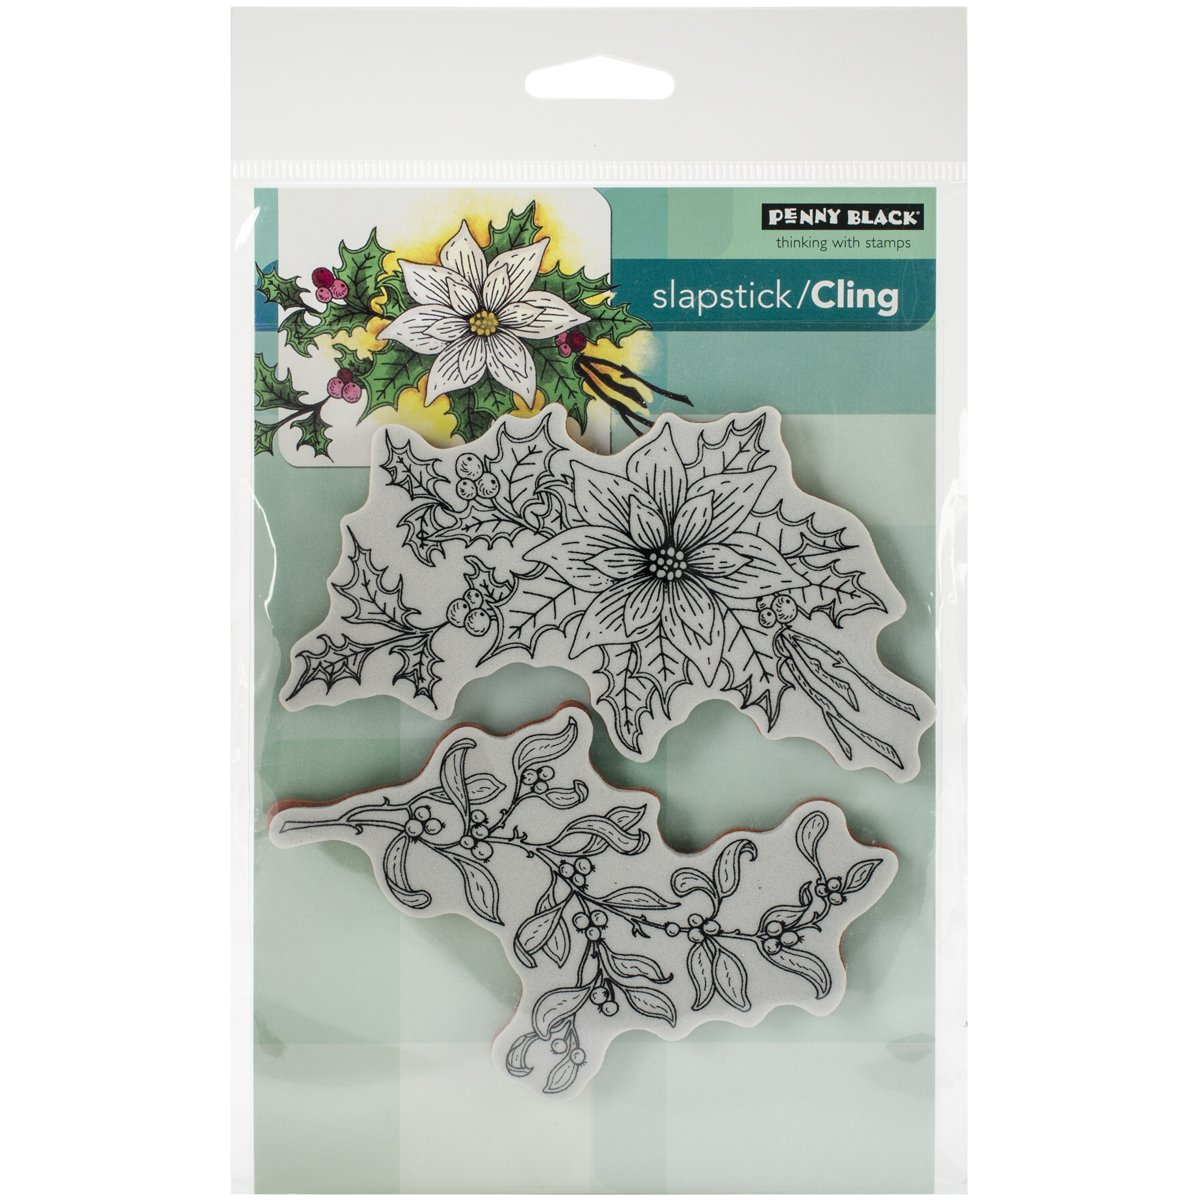 Penny Black 40-352 Decorative Rubber Stamps Festive Florals